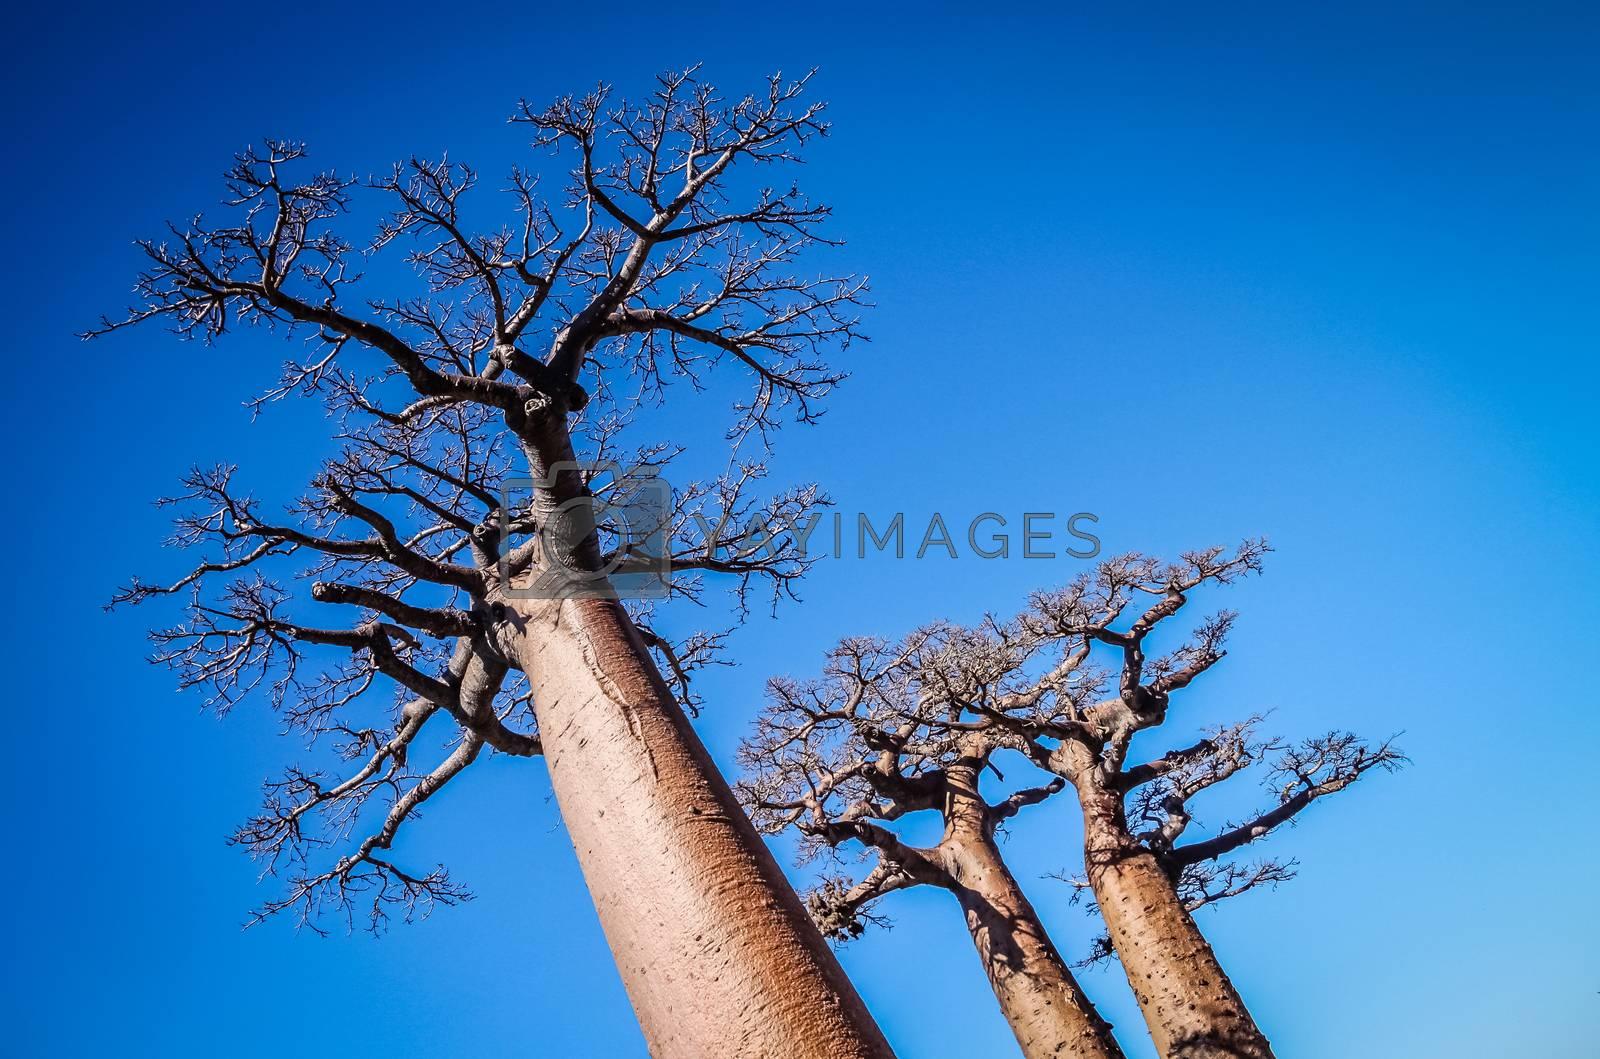 Huge baobabs in the Avenida de Baobab in Madagascar